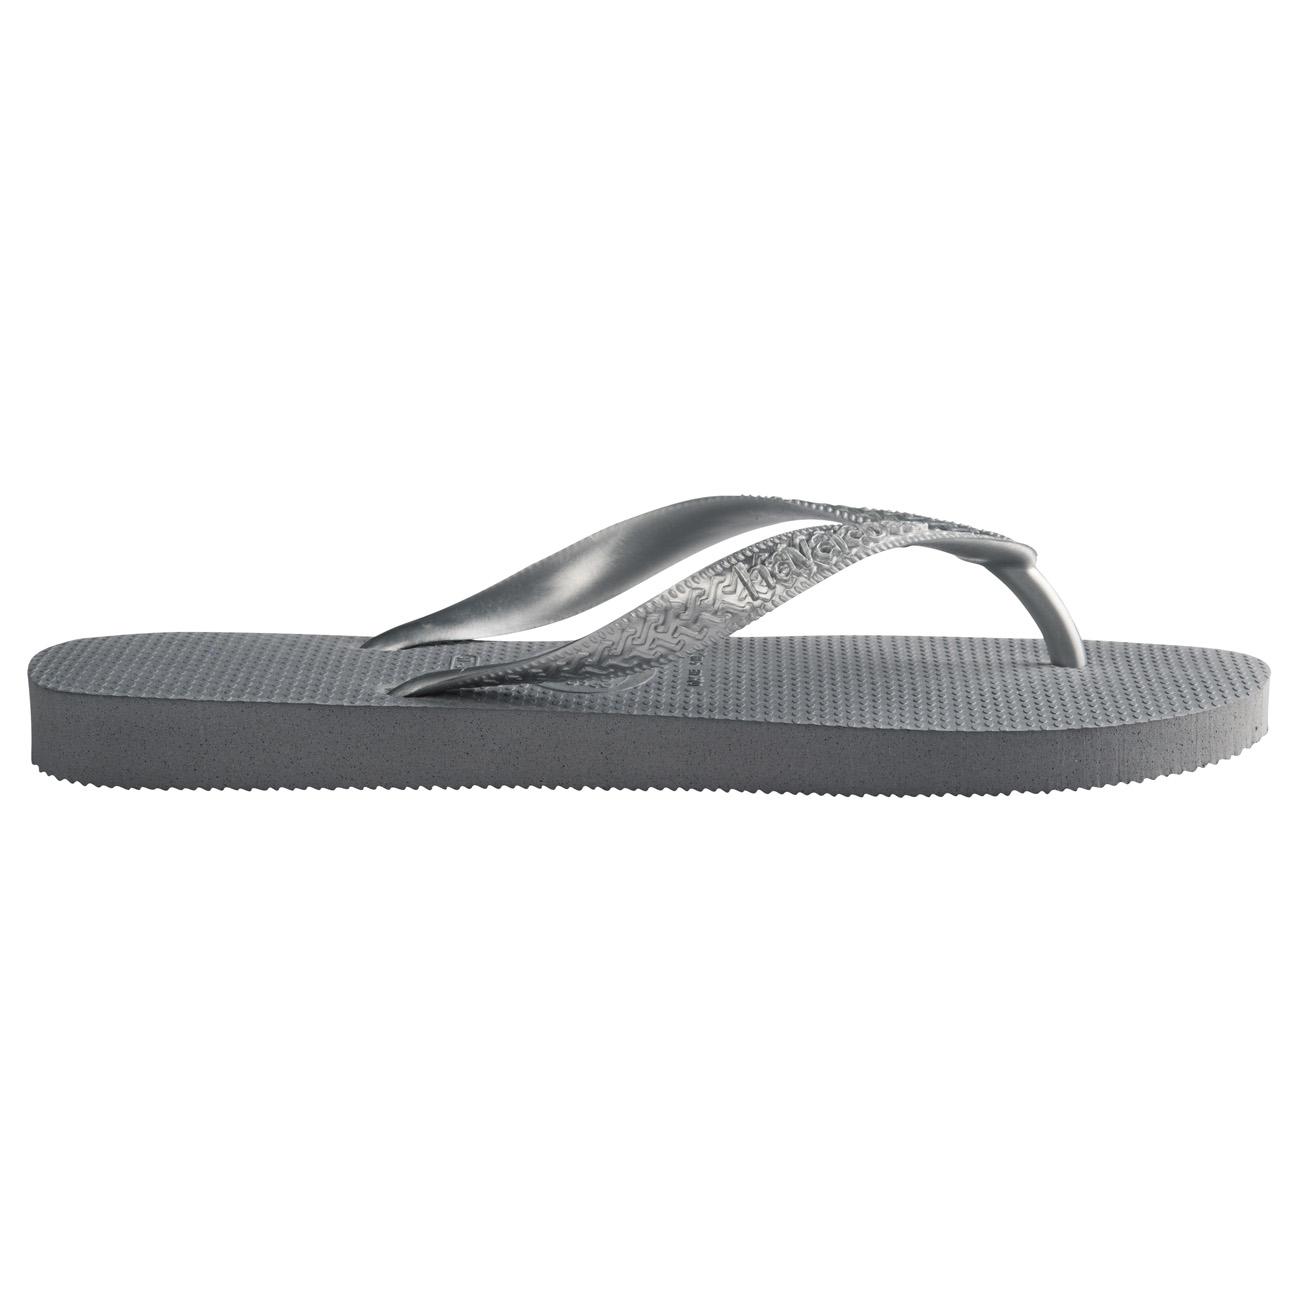 8c394c4504 Womens Havaianas Top Tiras Rubber Holiday Lightweight Sandals Flip Flops UK  3-8